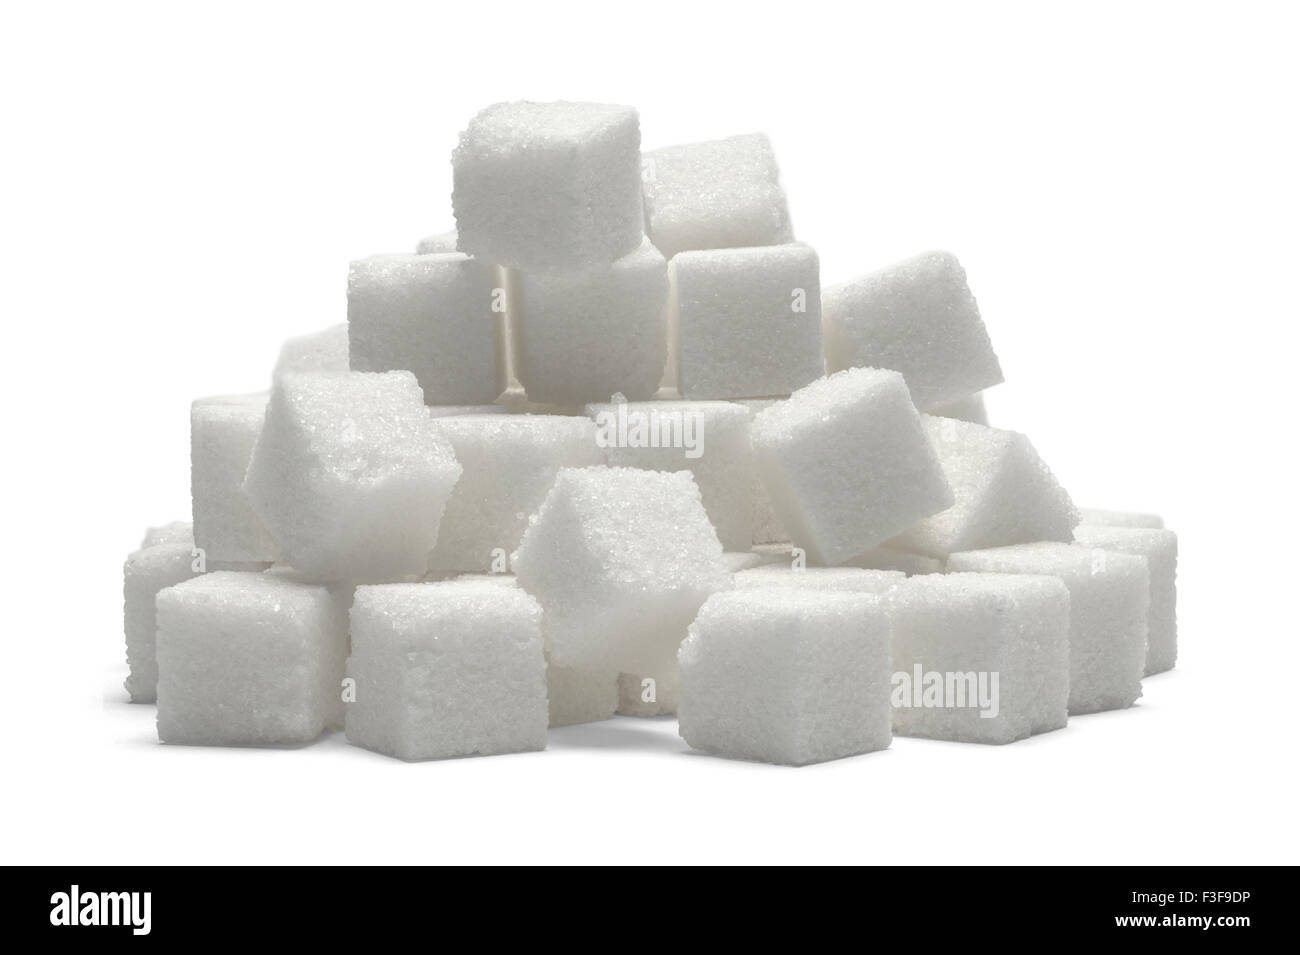 Montón de terrones de azúcar aislado sobre fondo blanco. Imagen De Stock